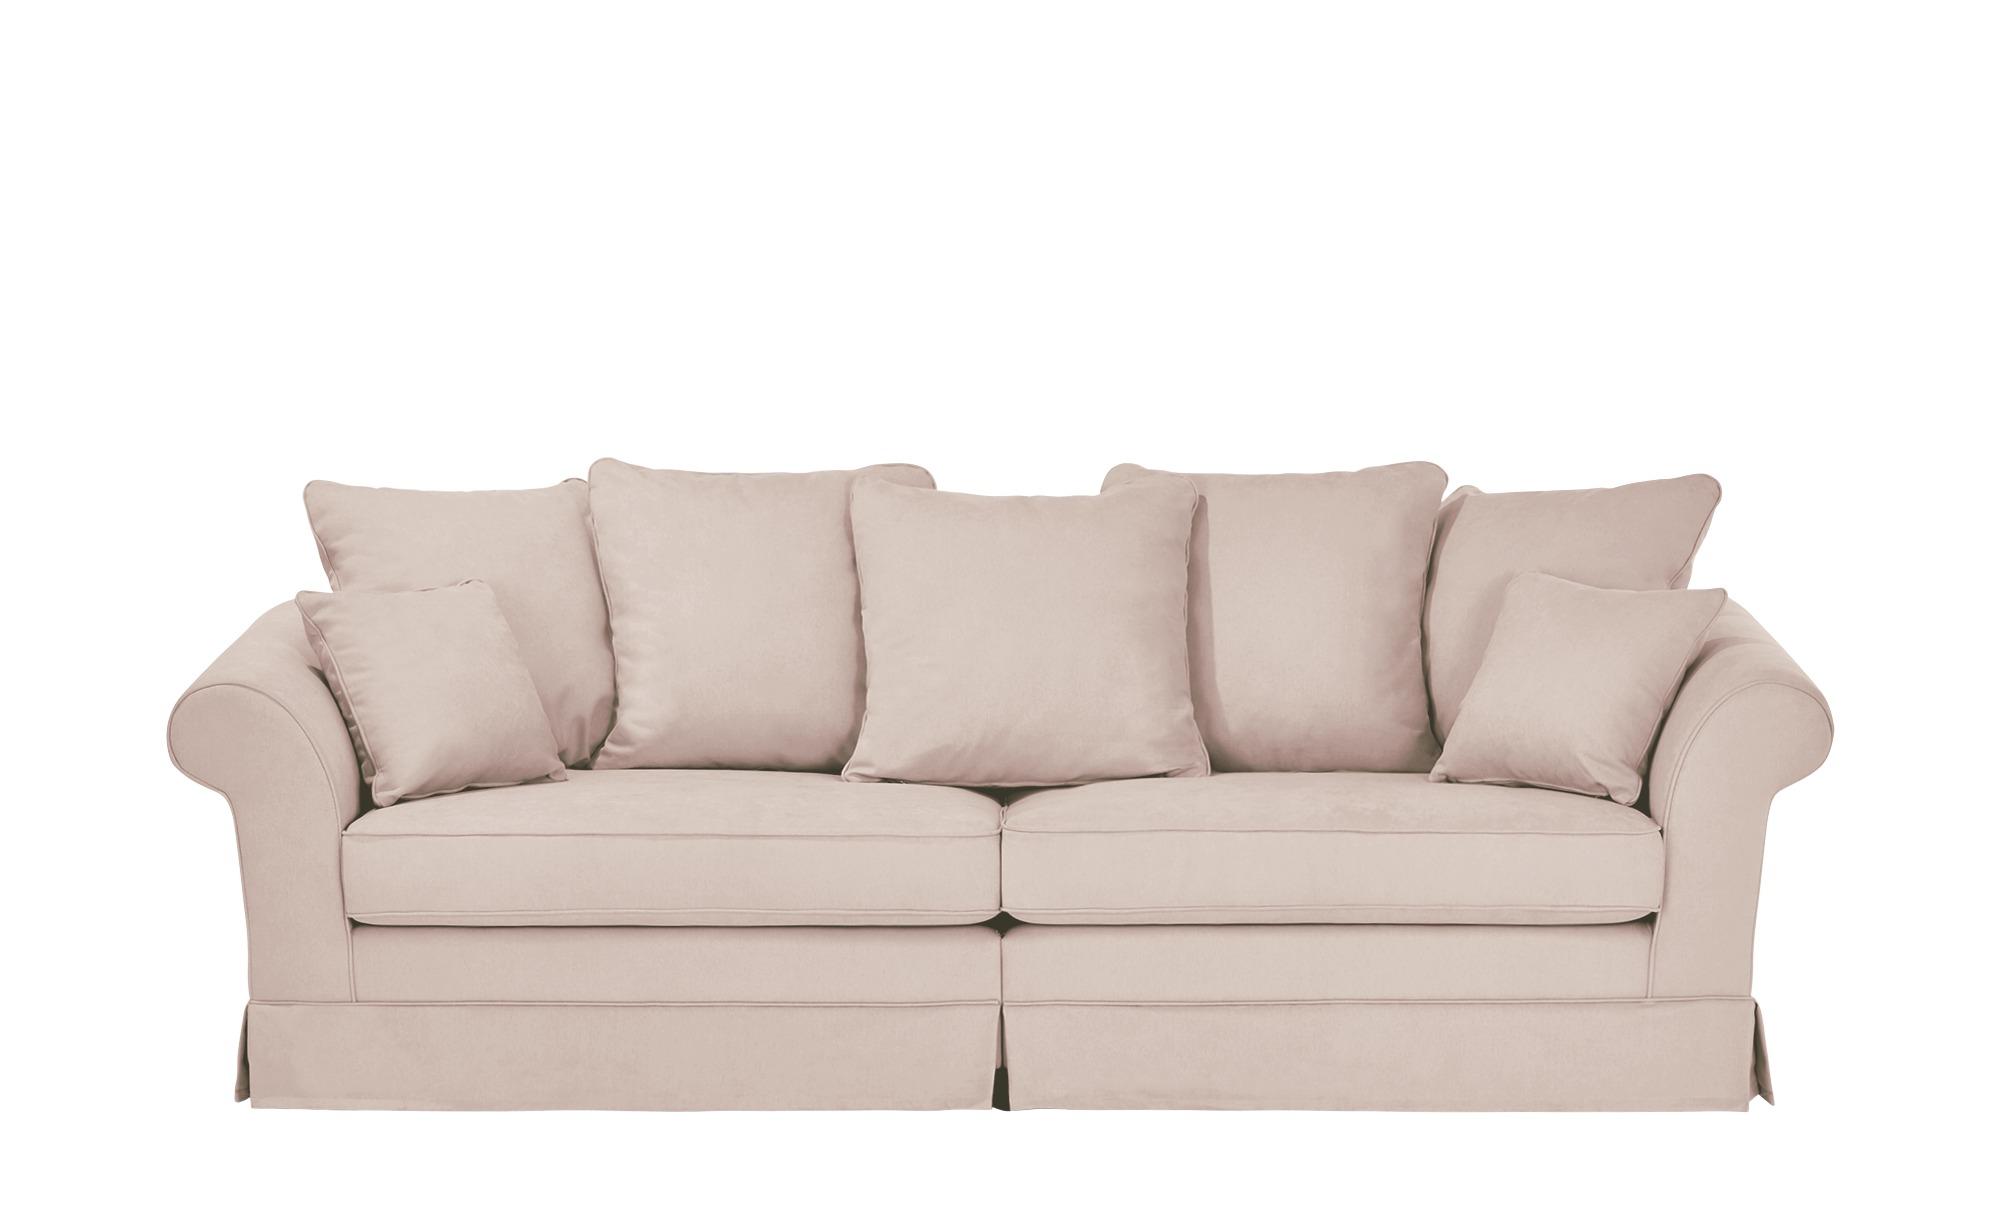 Megasofa Husse  Hampton ¦ rosa/pink ¦ Maße (cm): B: 264 H: 70 T: 111 Polstermöbel > Sofas > Einzelsofas - Höffner